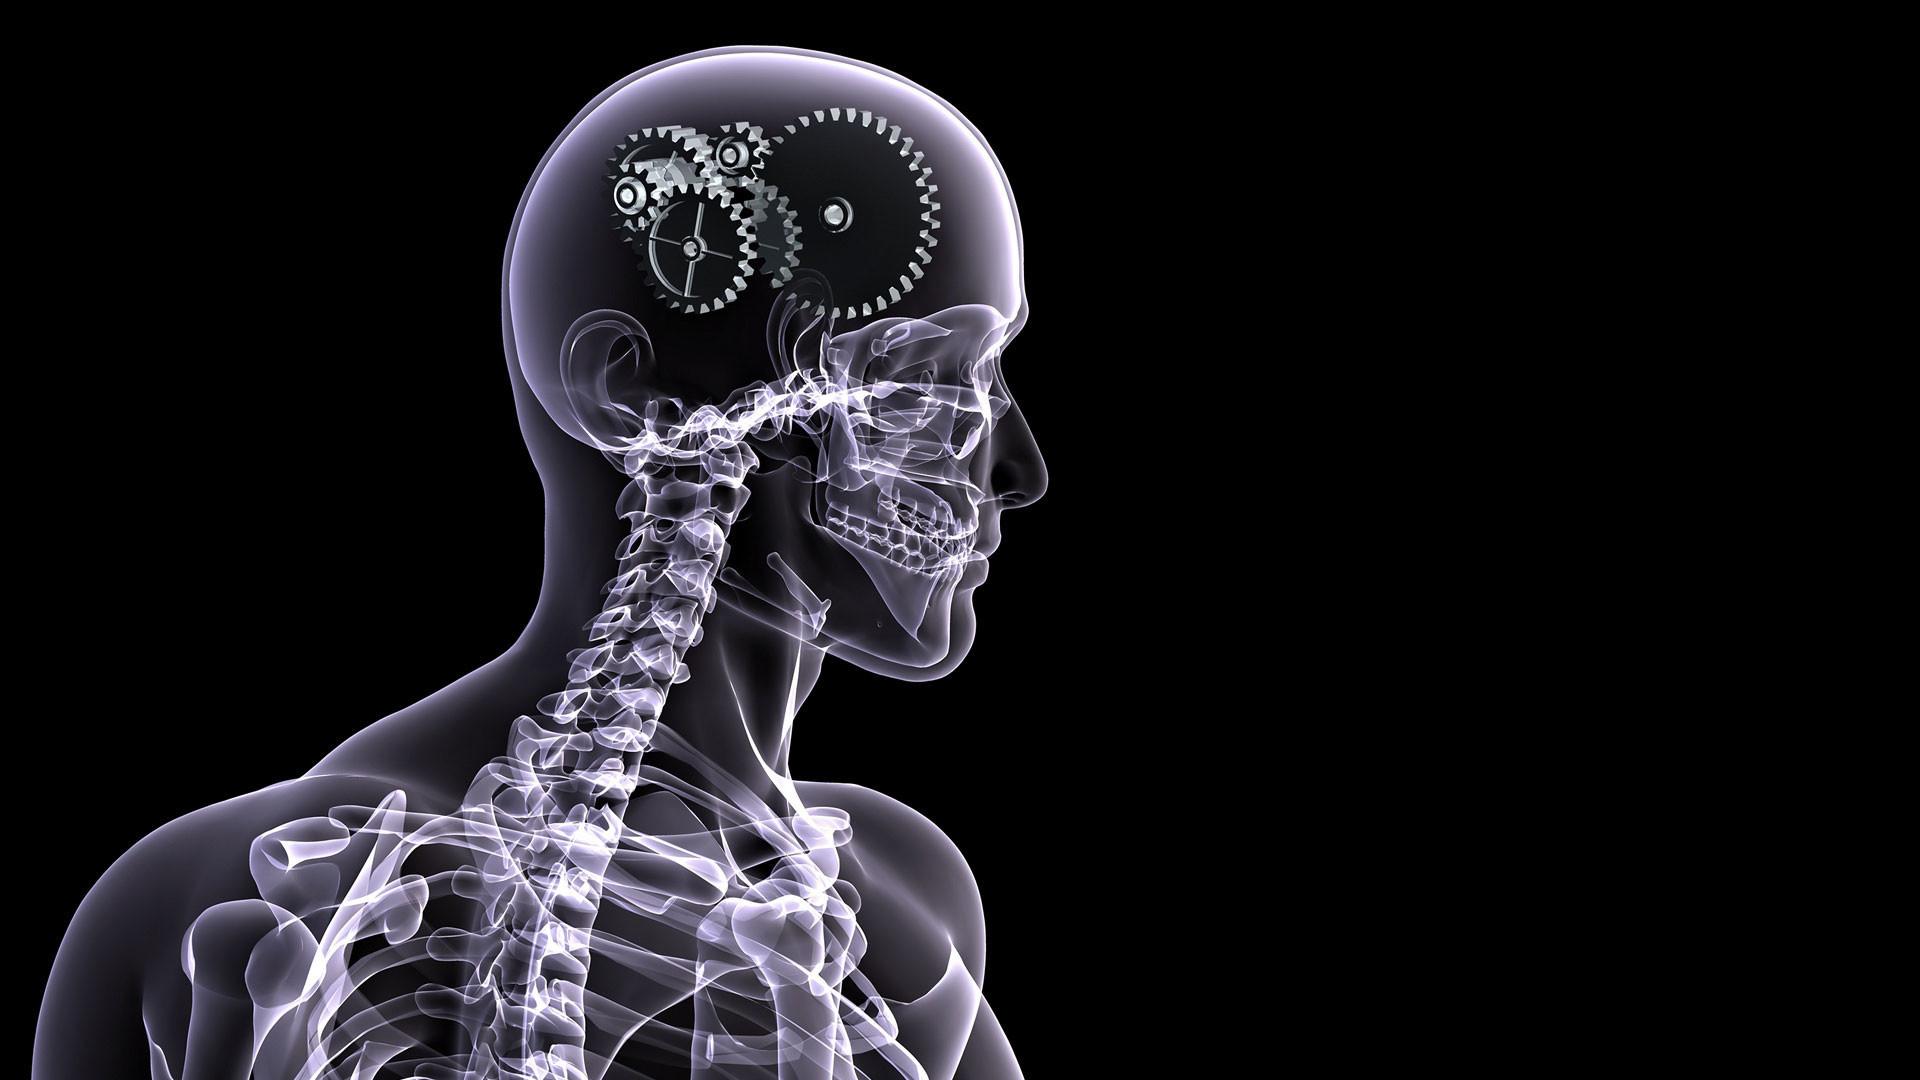 hd pics photos attractive skull brain x ray gears technology hd quality  desktop background wallpaper